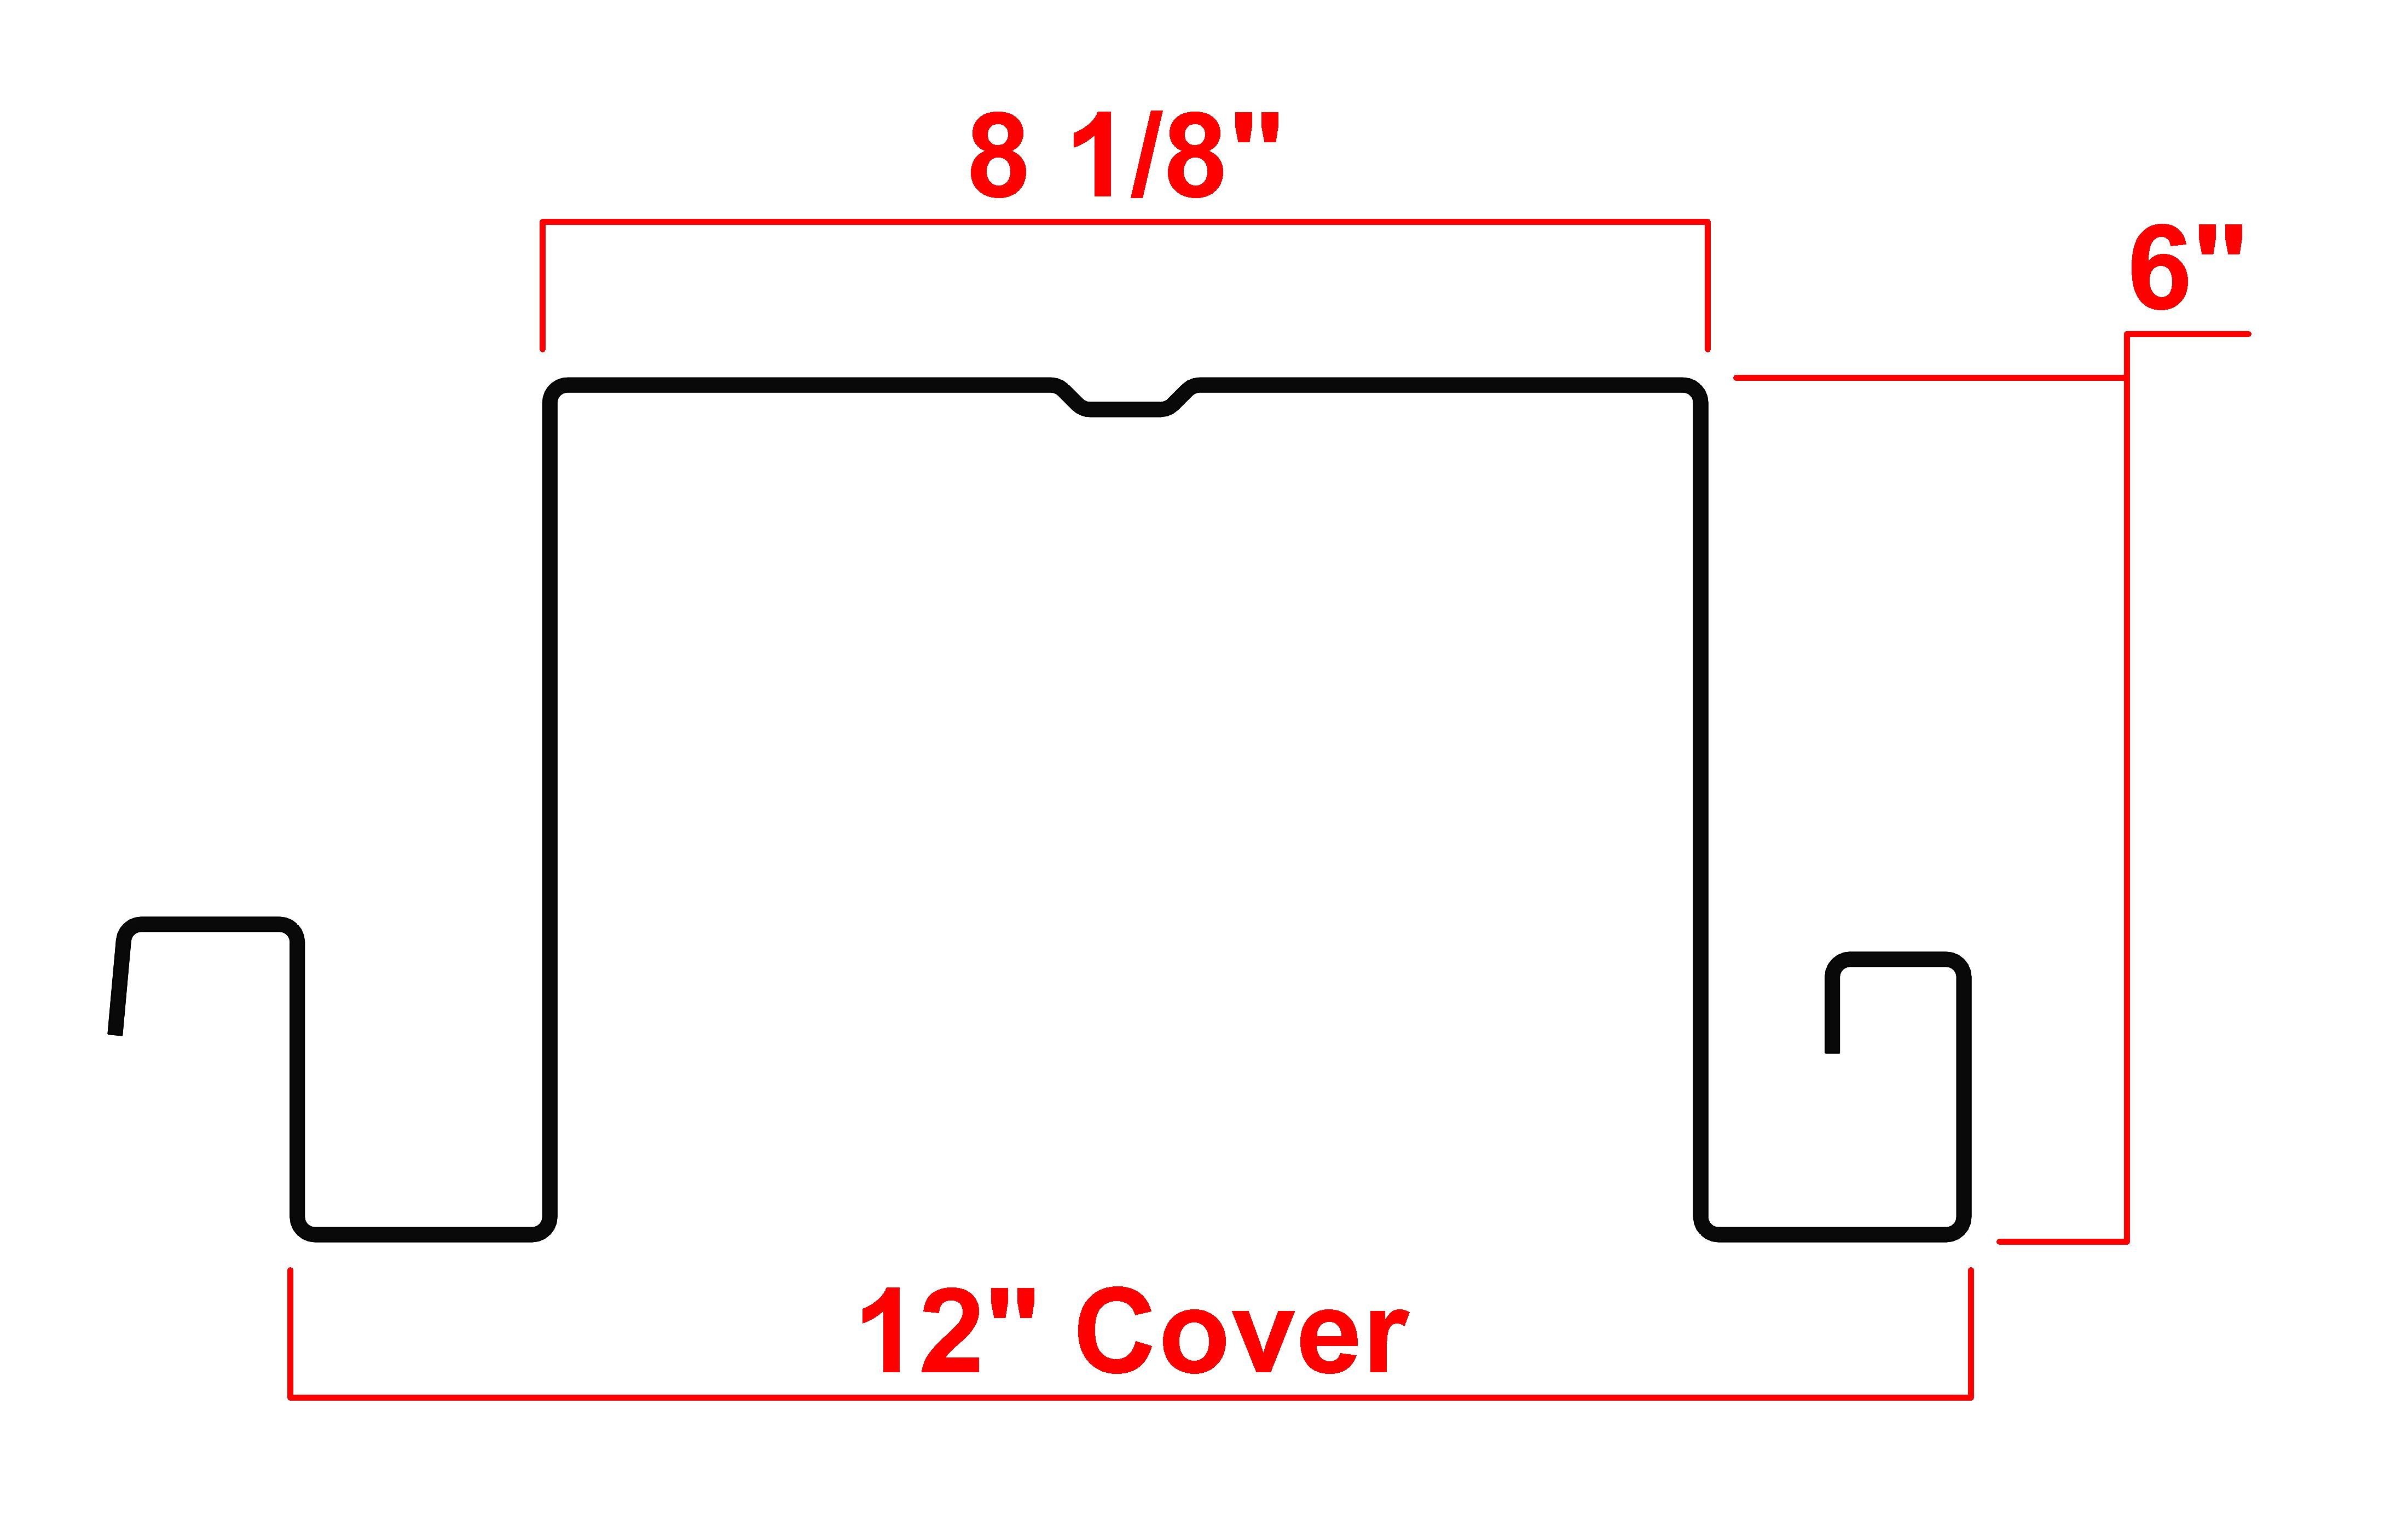 "6"" Type LS Deck Profile"